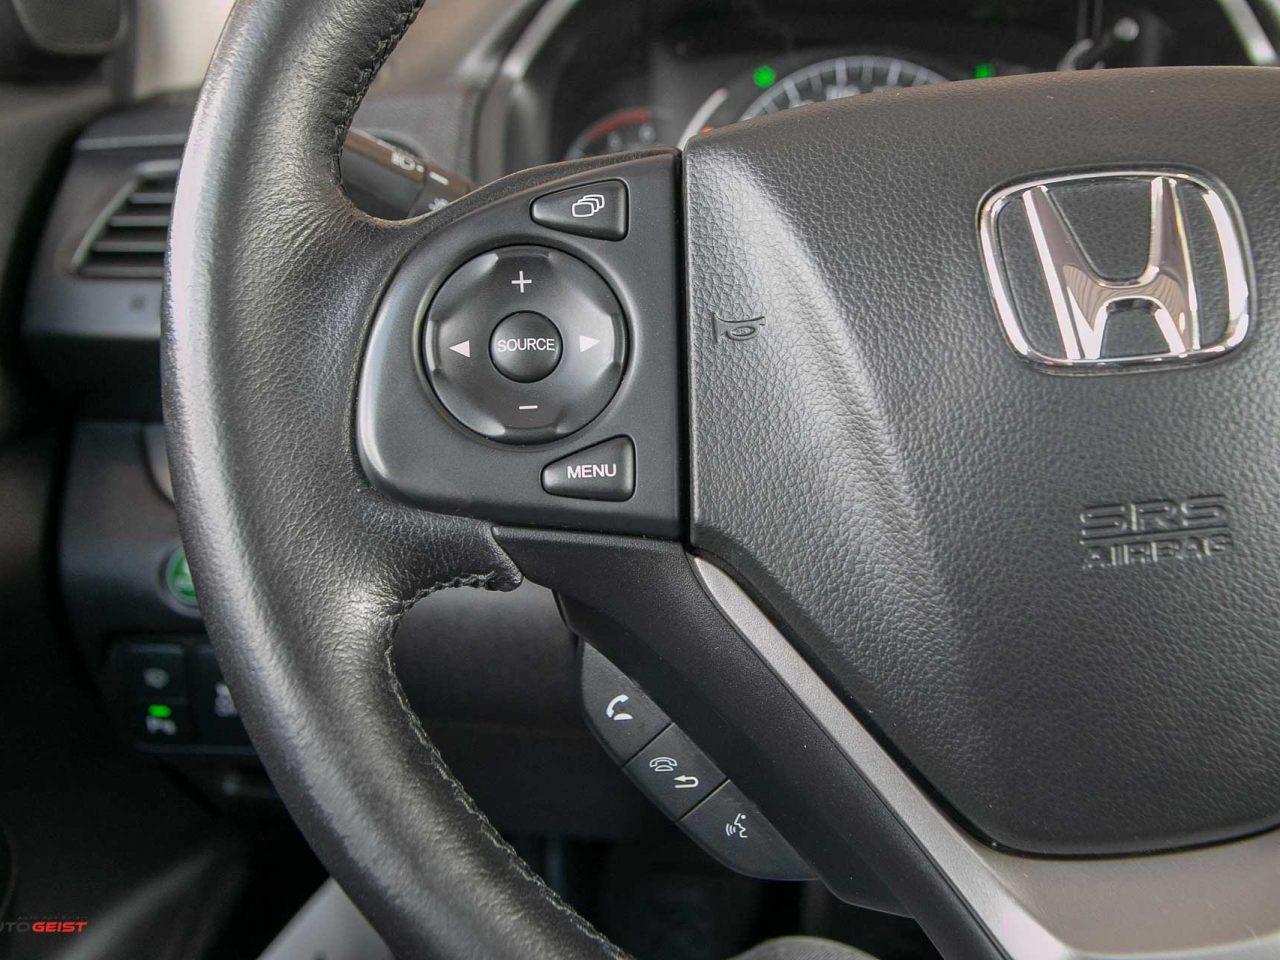 honda-cr-v-manual-8545